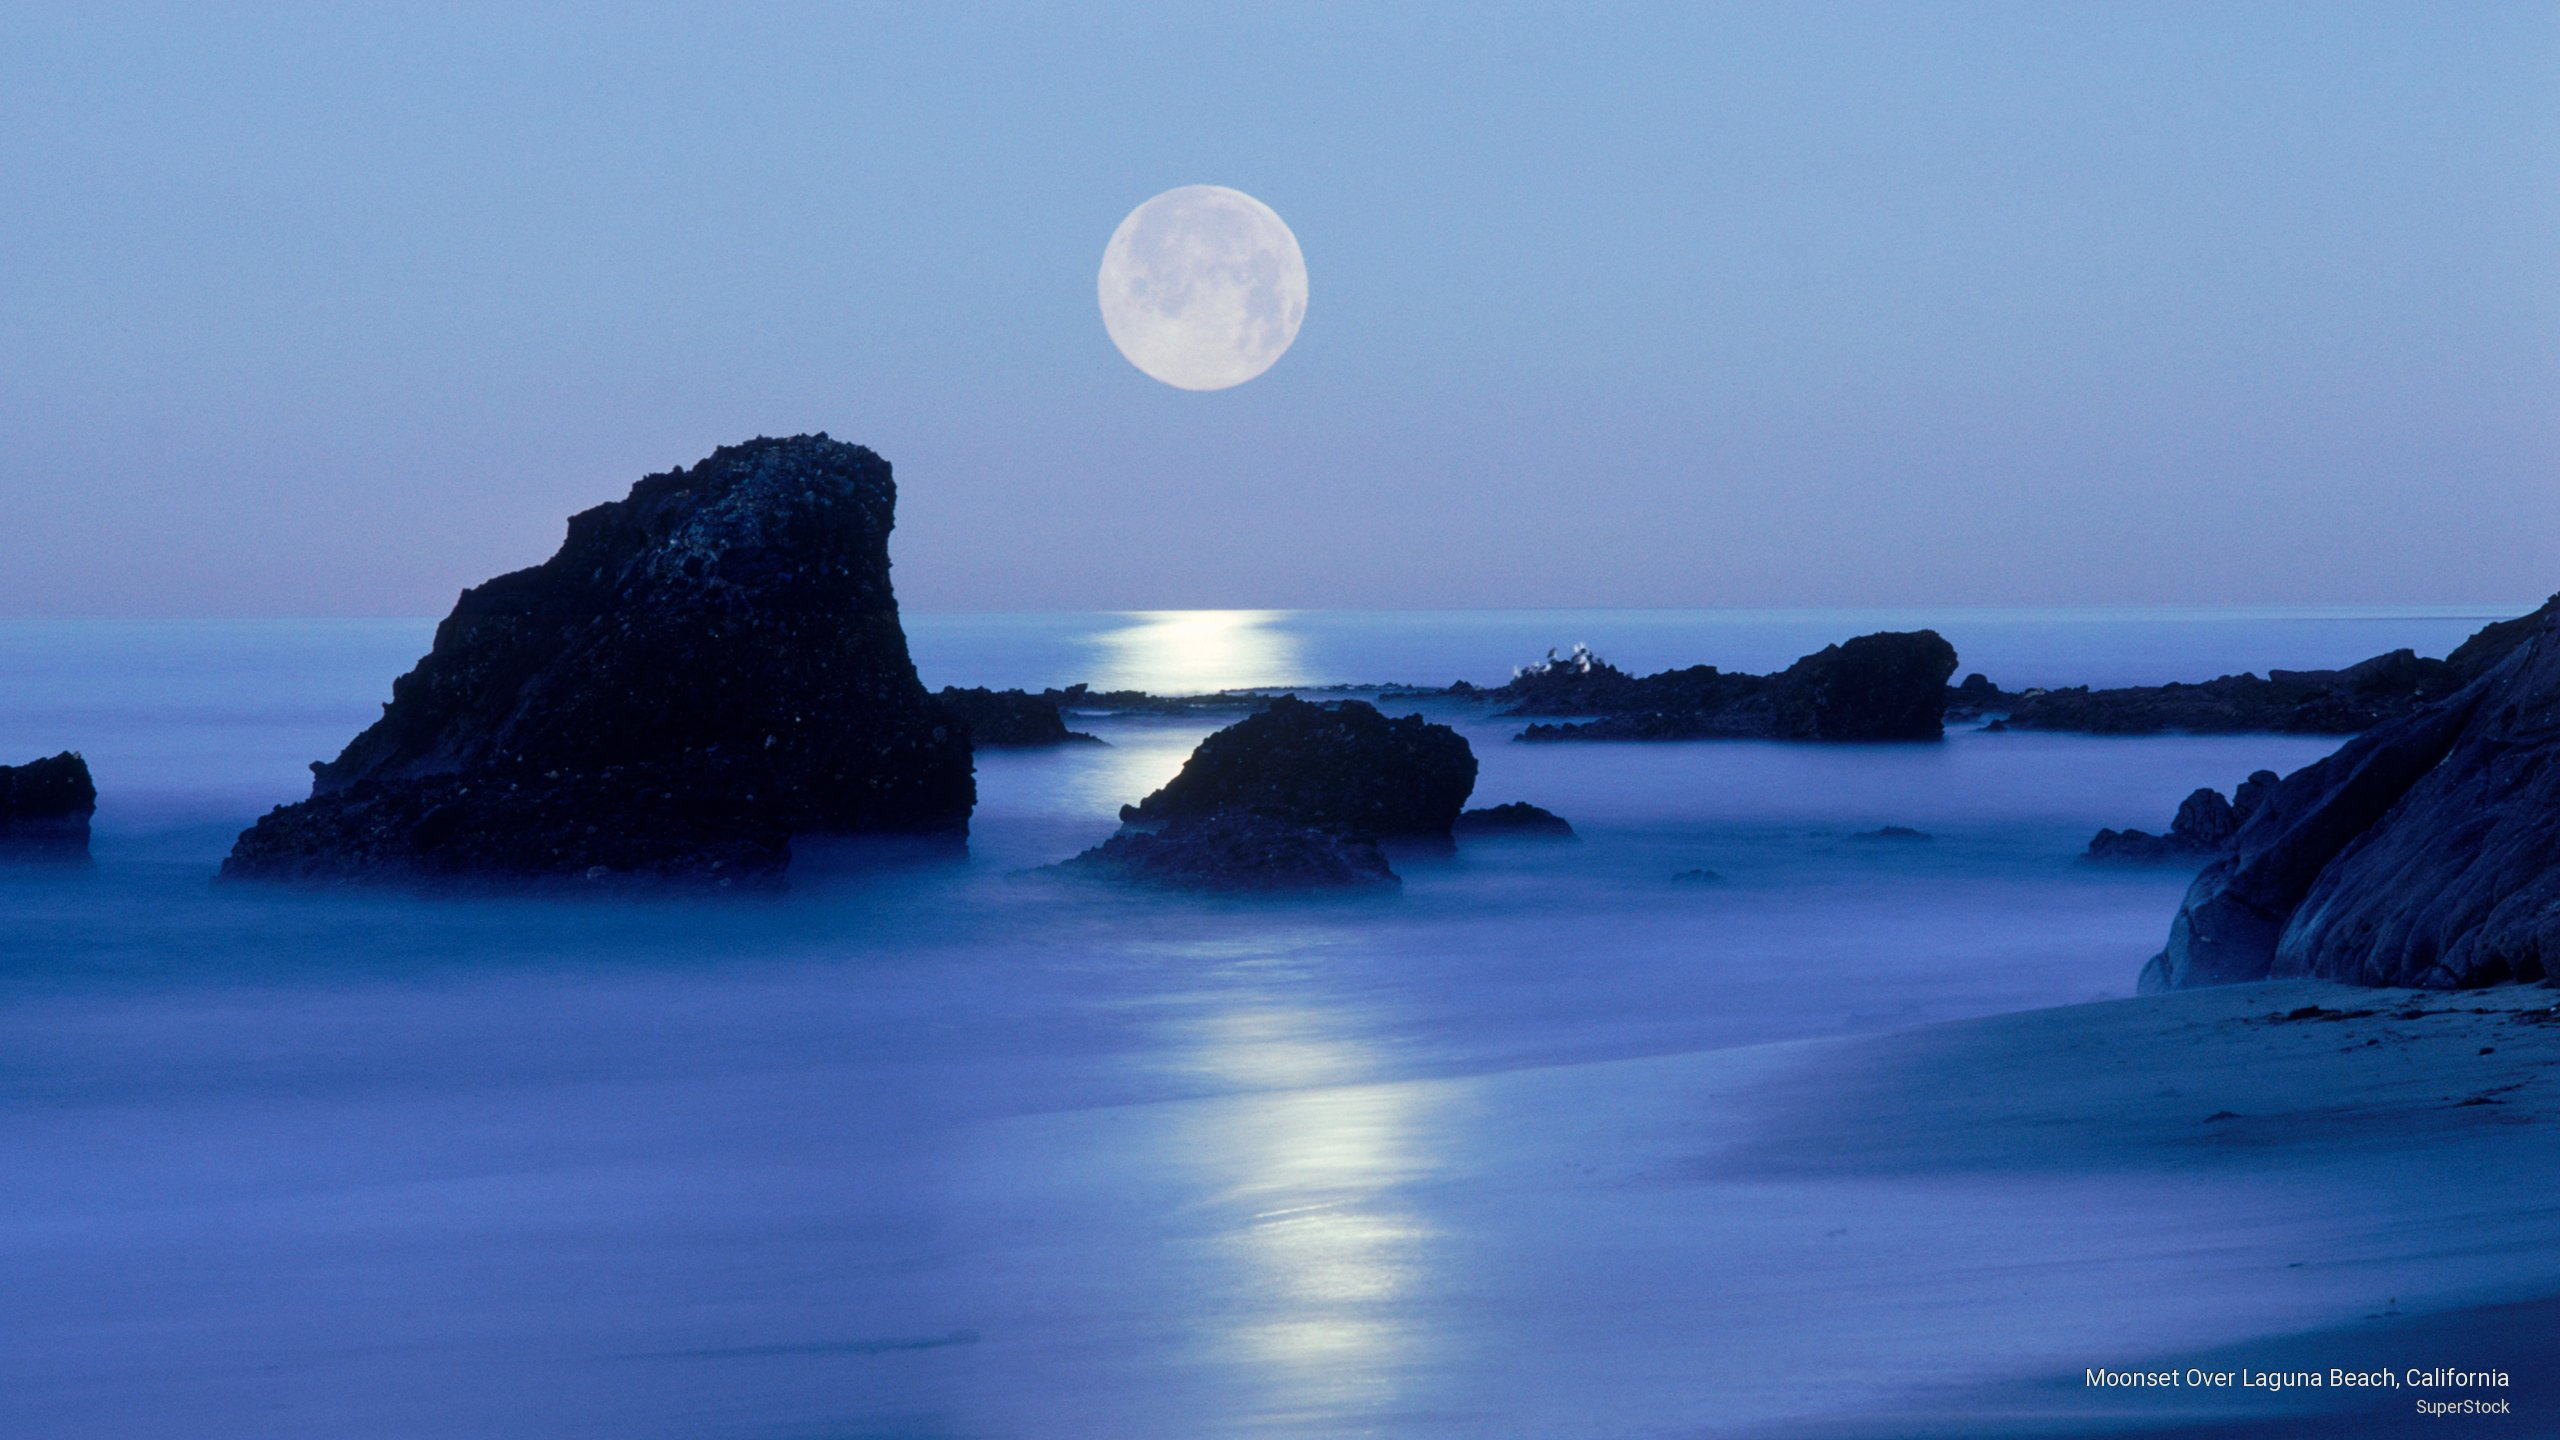 Moonset Over Laguna Beach, California